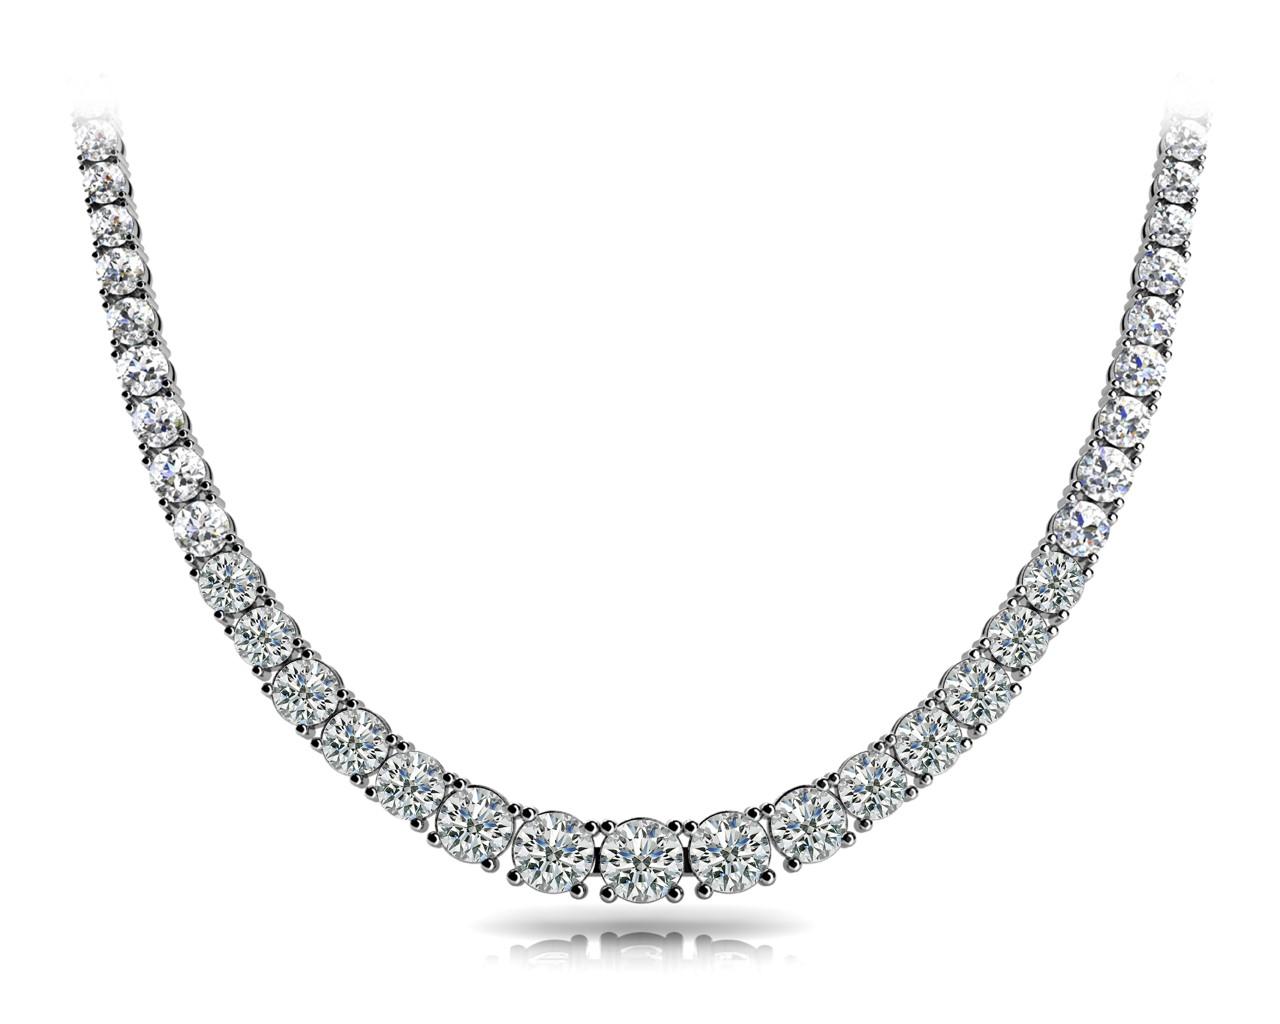 14k-white-gold-eternity-diamond-necklace-60019-20